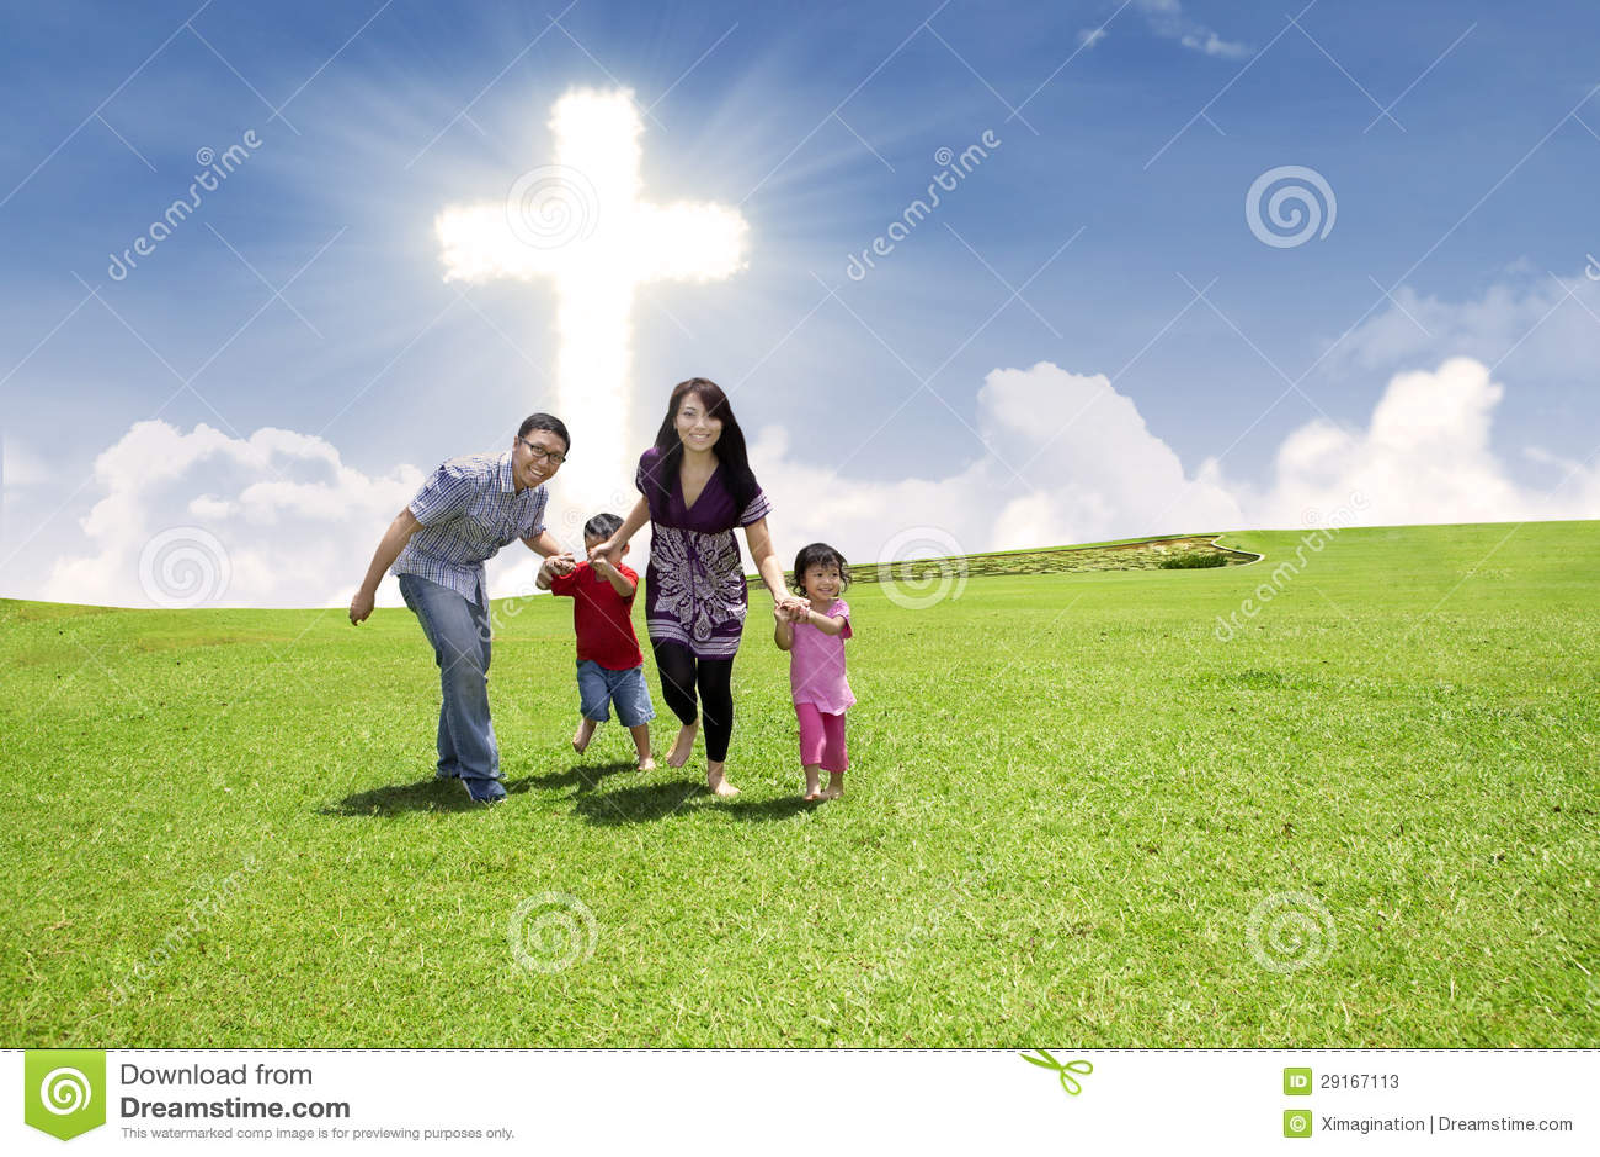 Christian Family Running In Park Stock Image  Image 29167113